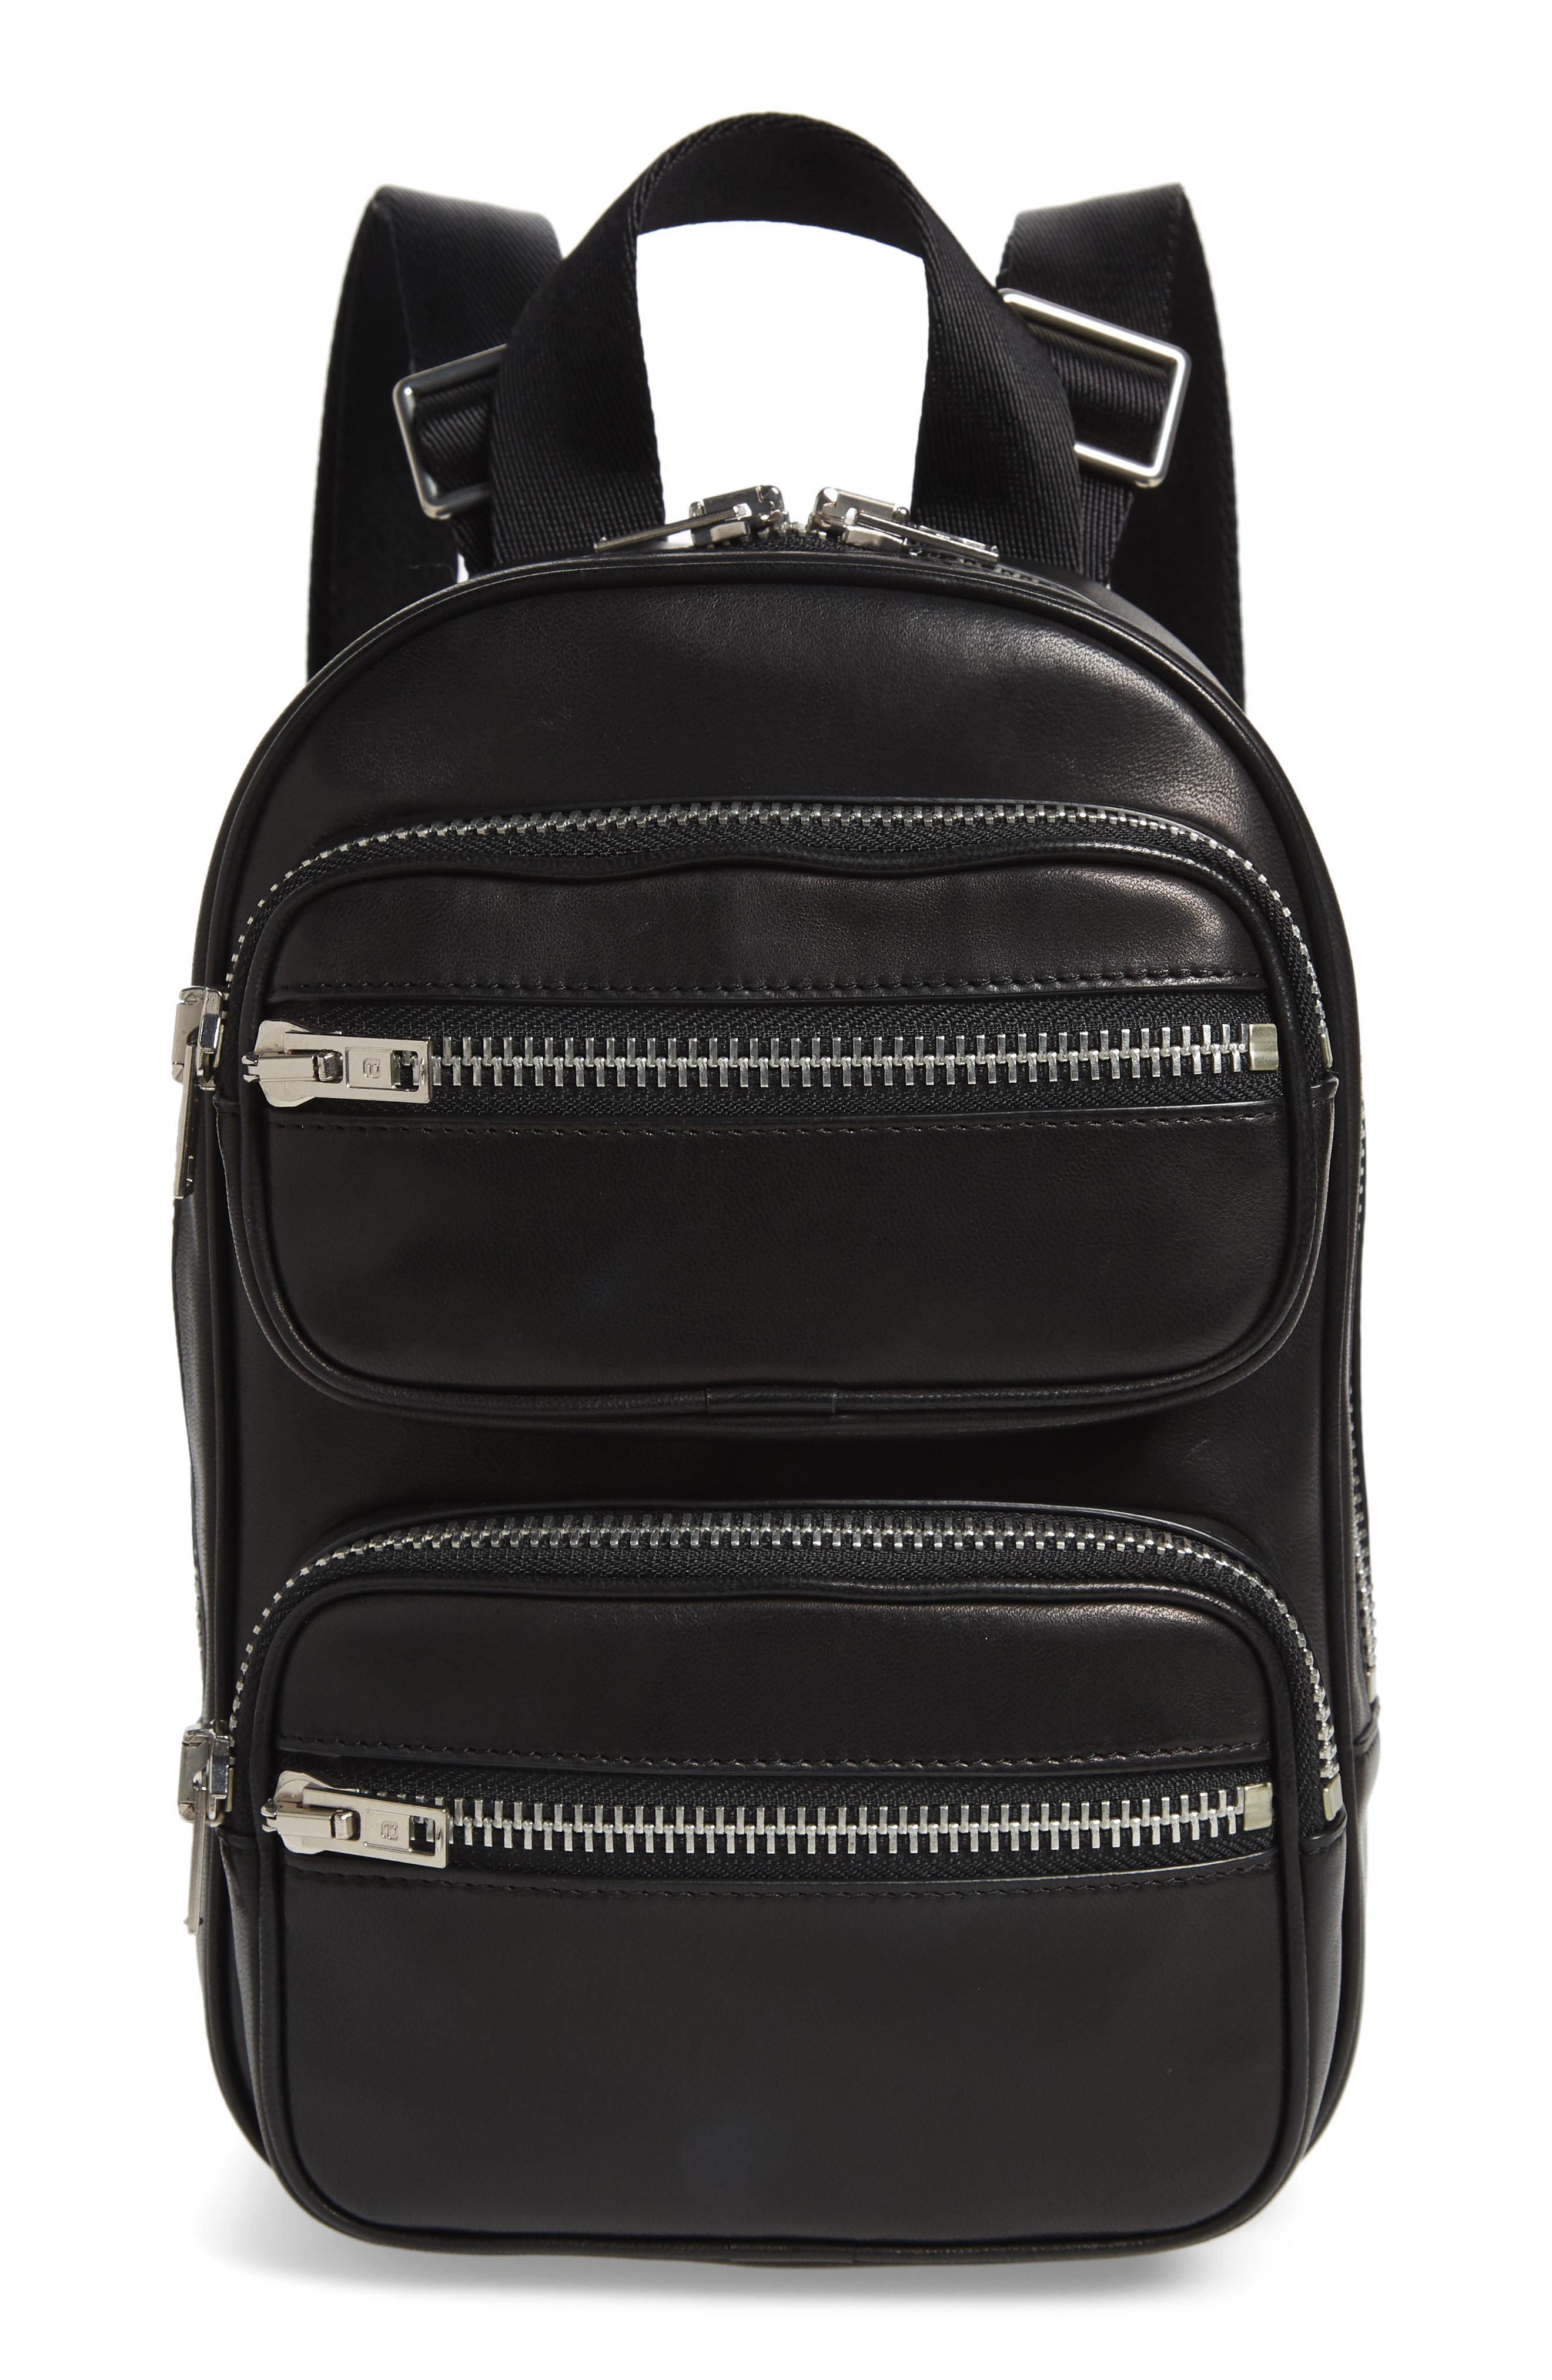 Attica Lambskin Leather Backpack